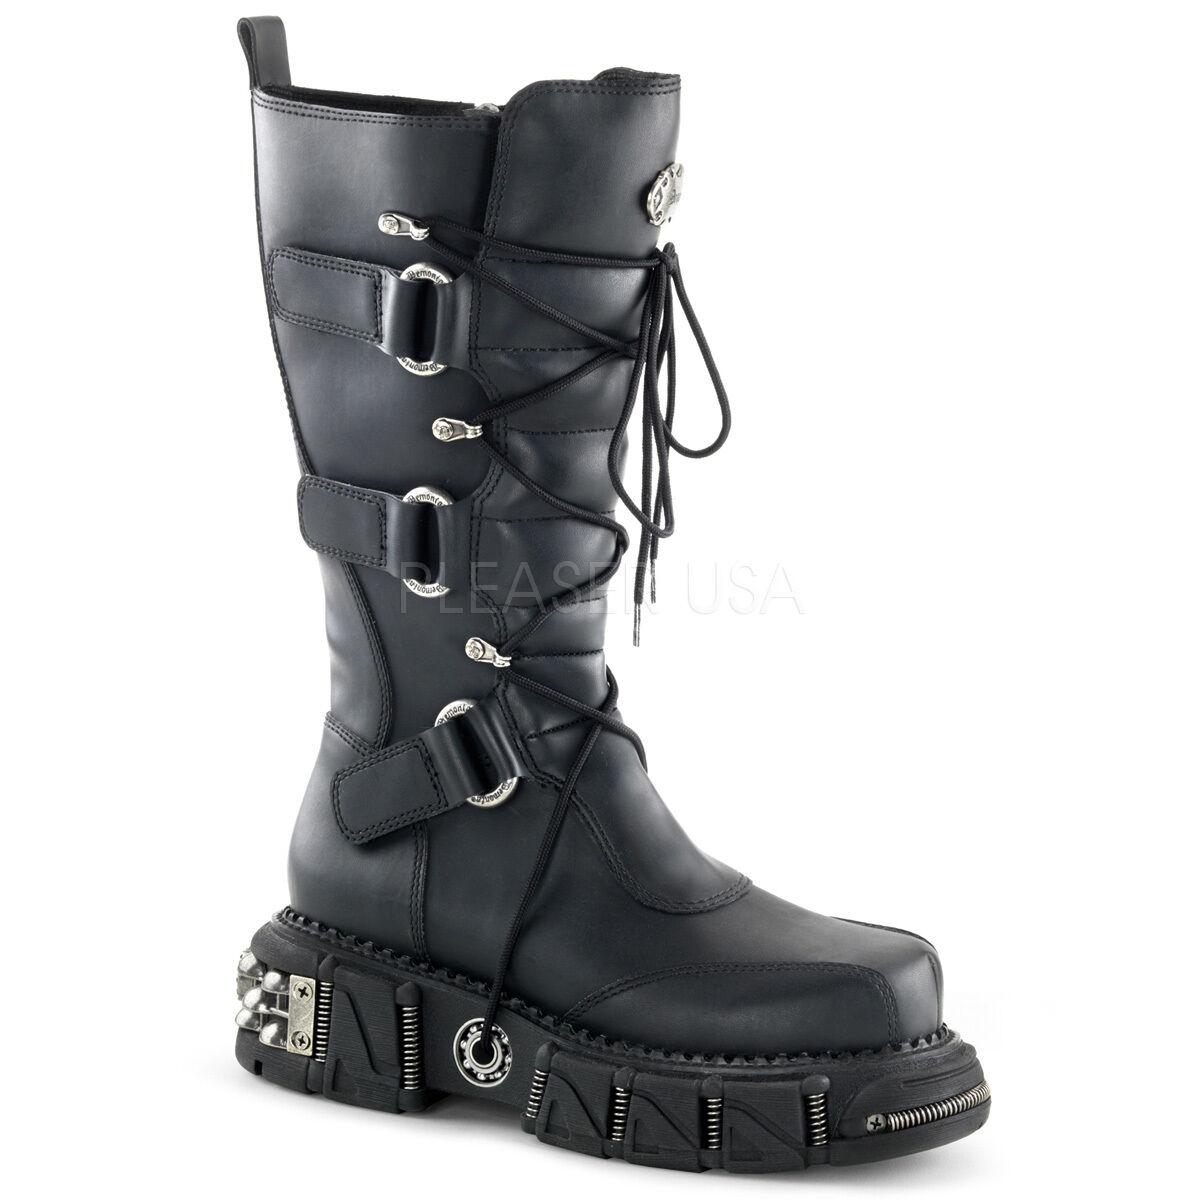 Demonia DMA 3005 Unisex 3 Fibbia Cinturino Lacci Punk Rock Vegan Stivali